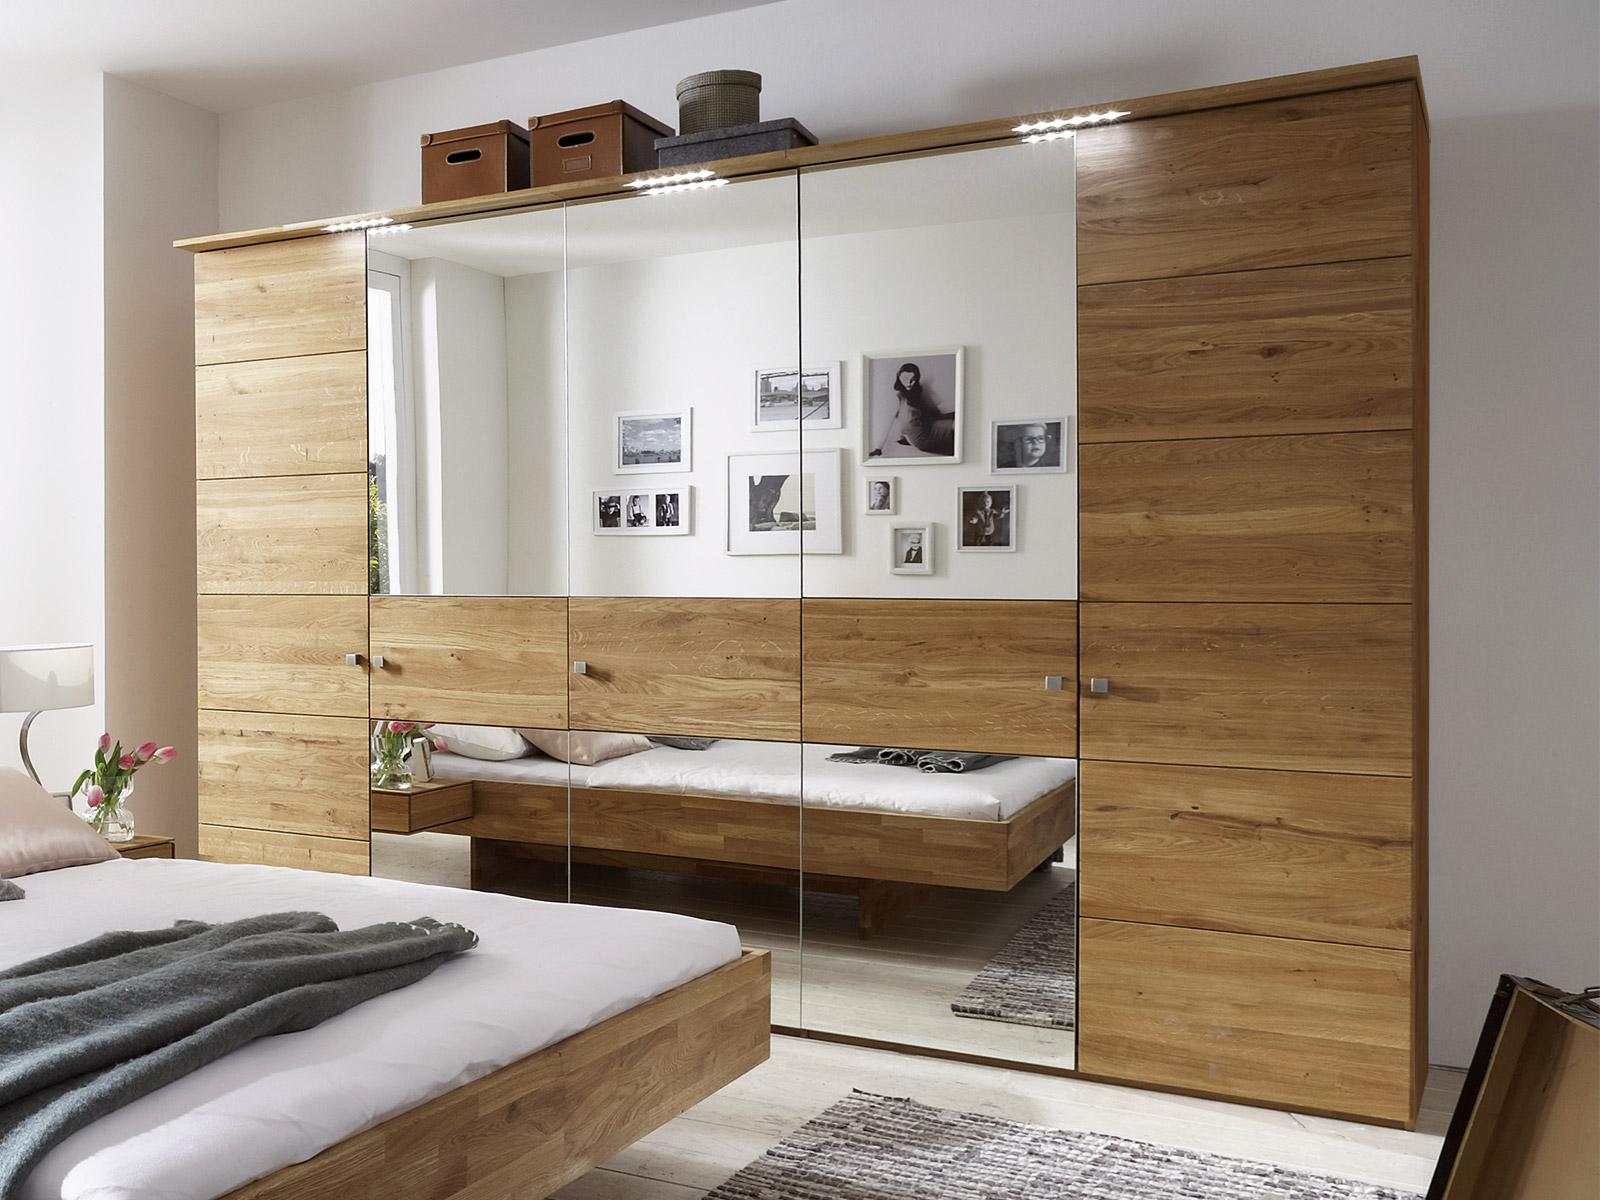 1000 ideas about kleiderschrank massivholz on pinterest bett massivholz holzbett massiv and. Black Bedroom Furniture Sets. Home Design Ideas